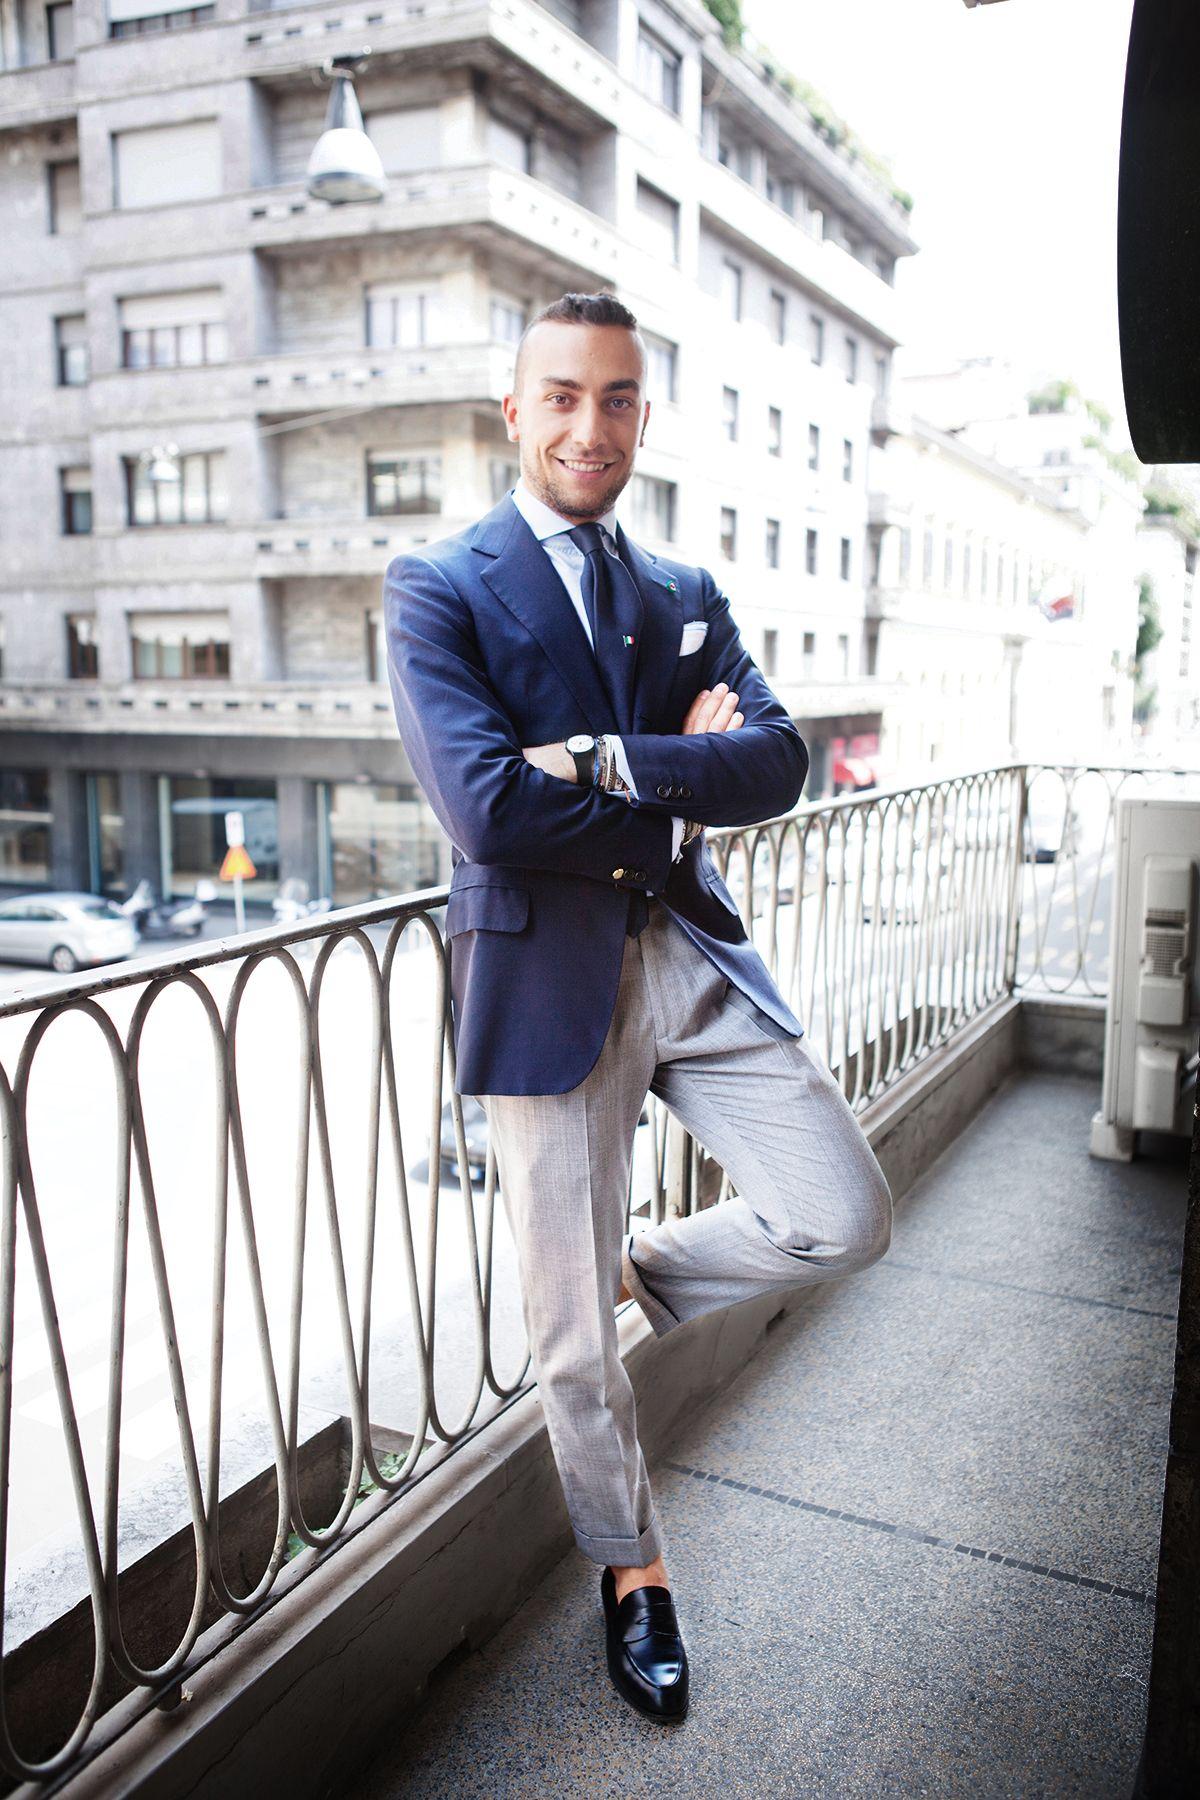 Massimiliano Andreacchio Caraceni- Faces of Luxury. www.albertalagrup.com